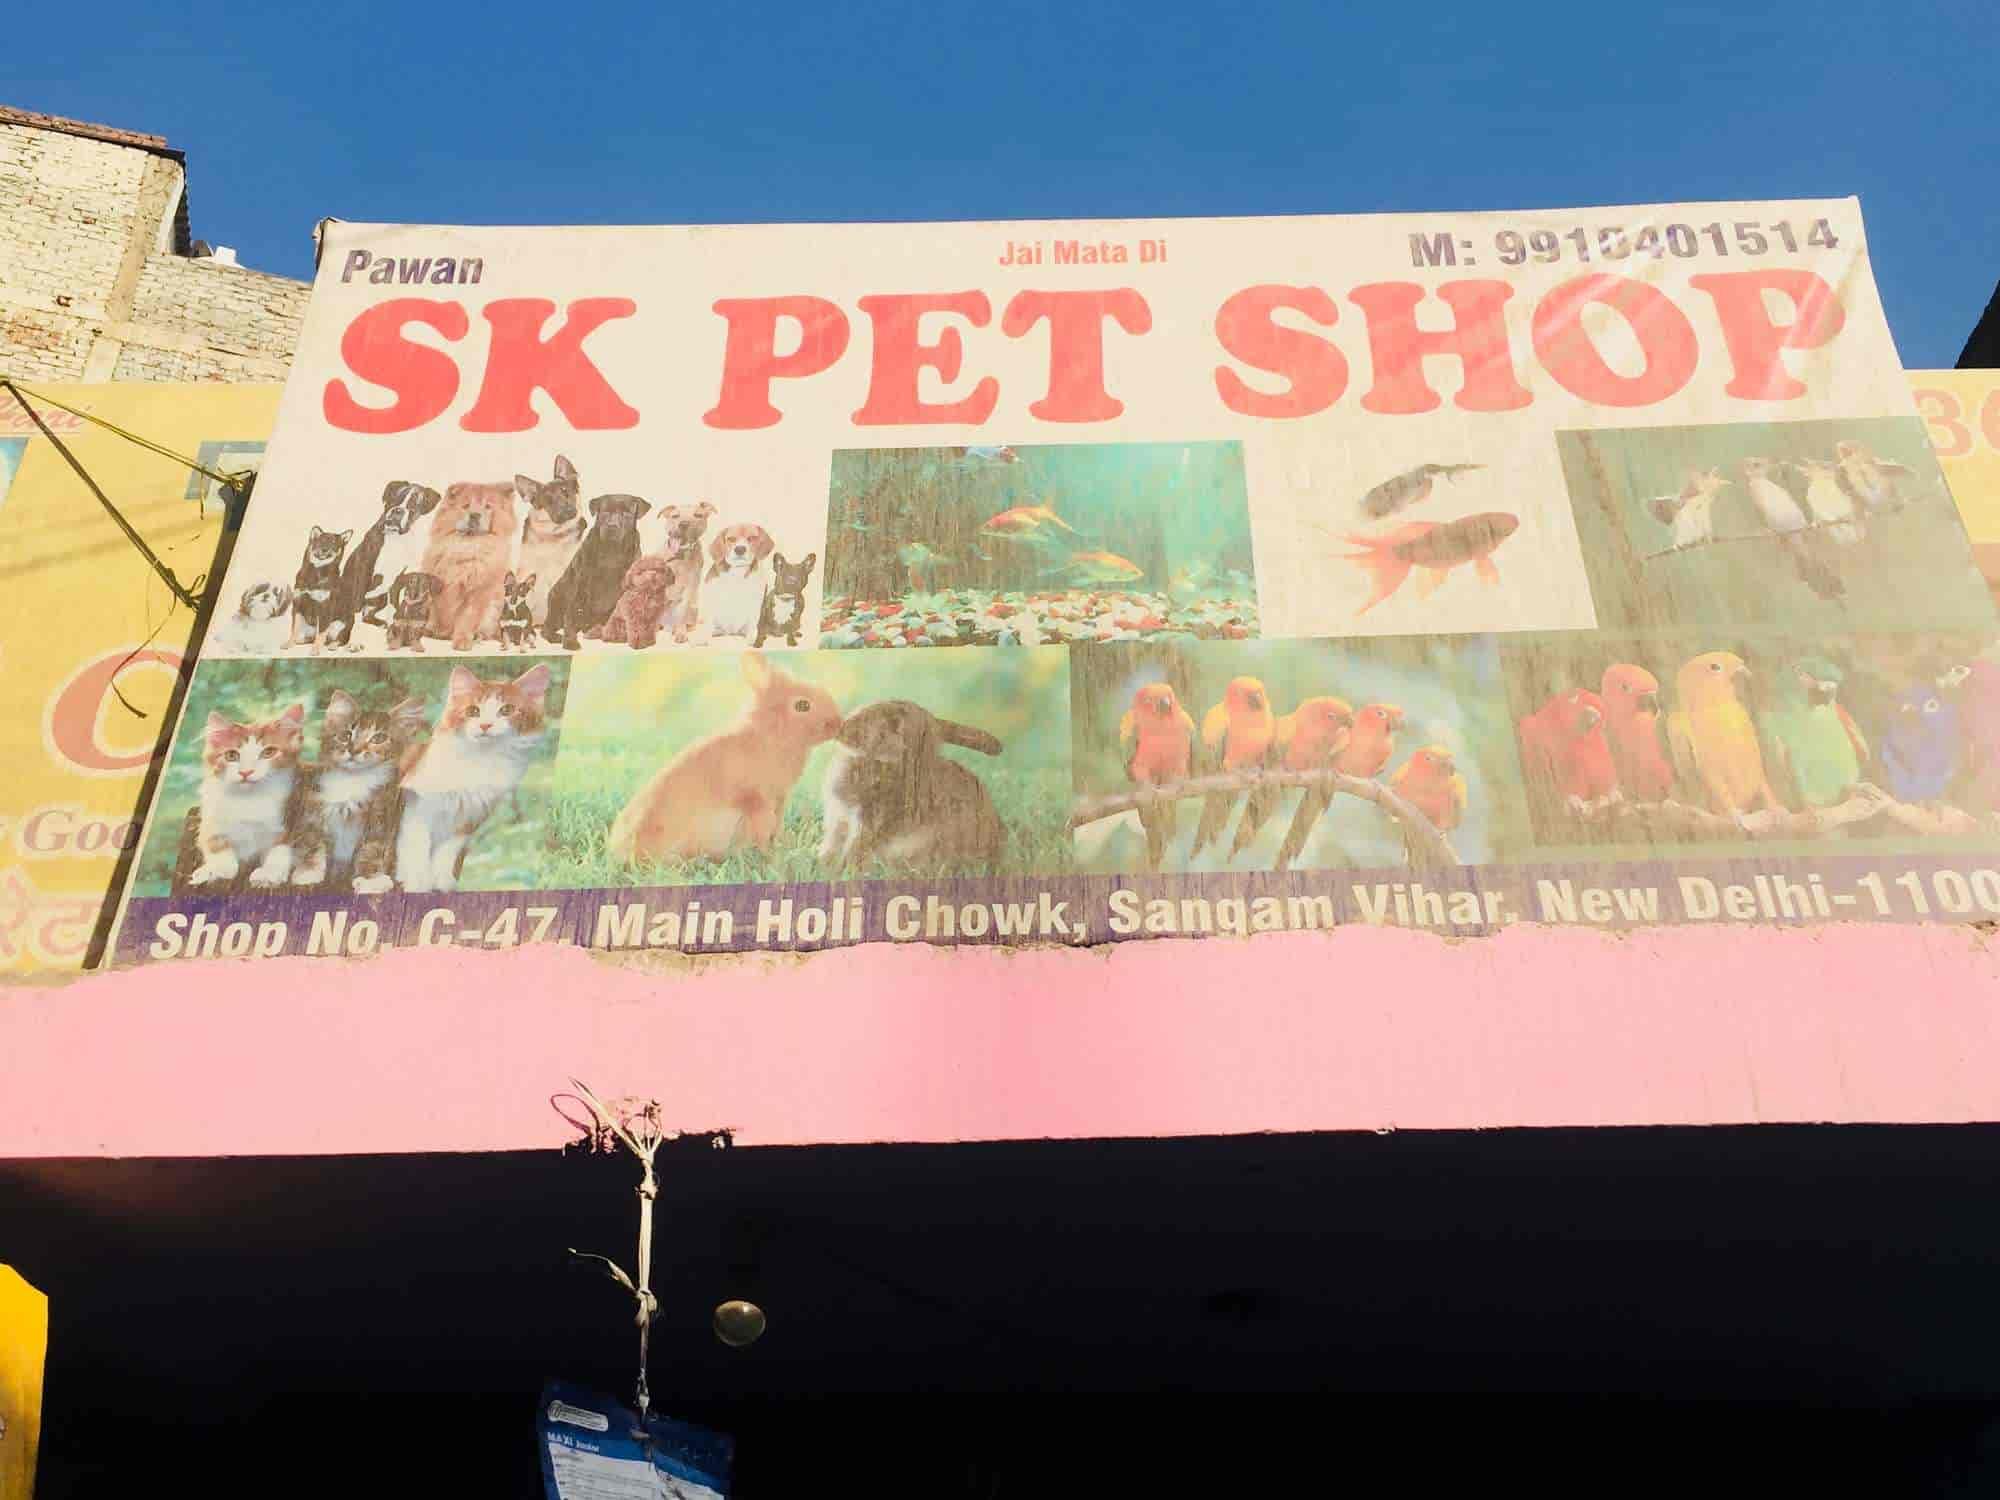 S K Pet Shop, Devli Gaon - Pet Shops in Delhi - Justdial